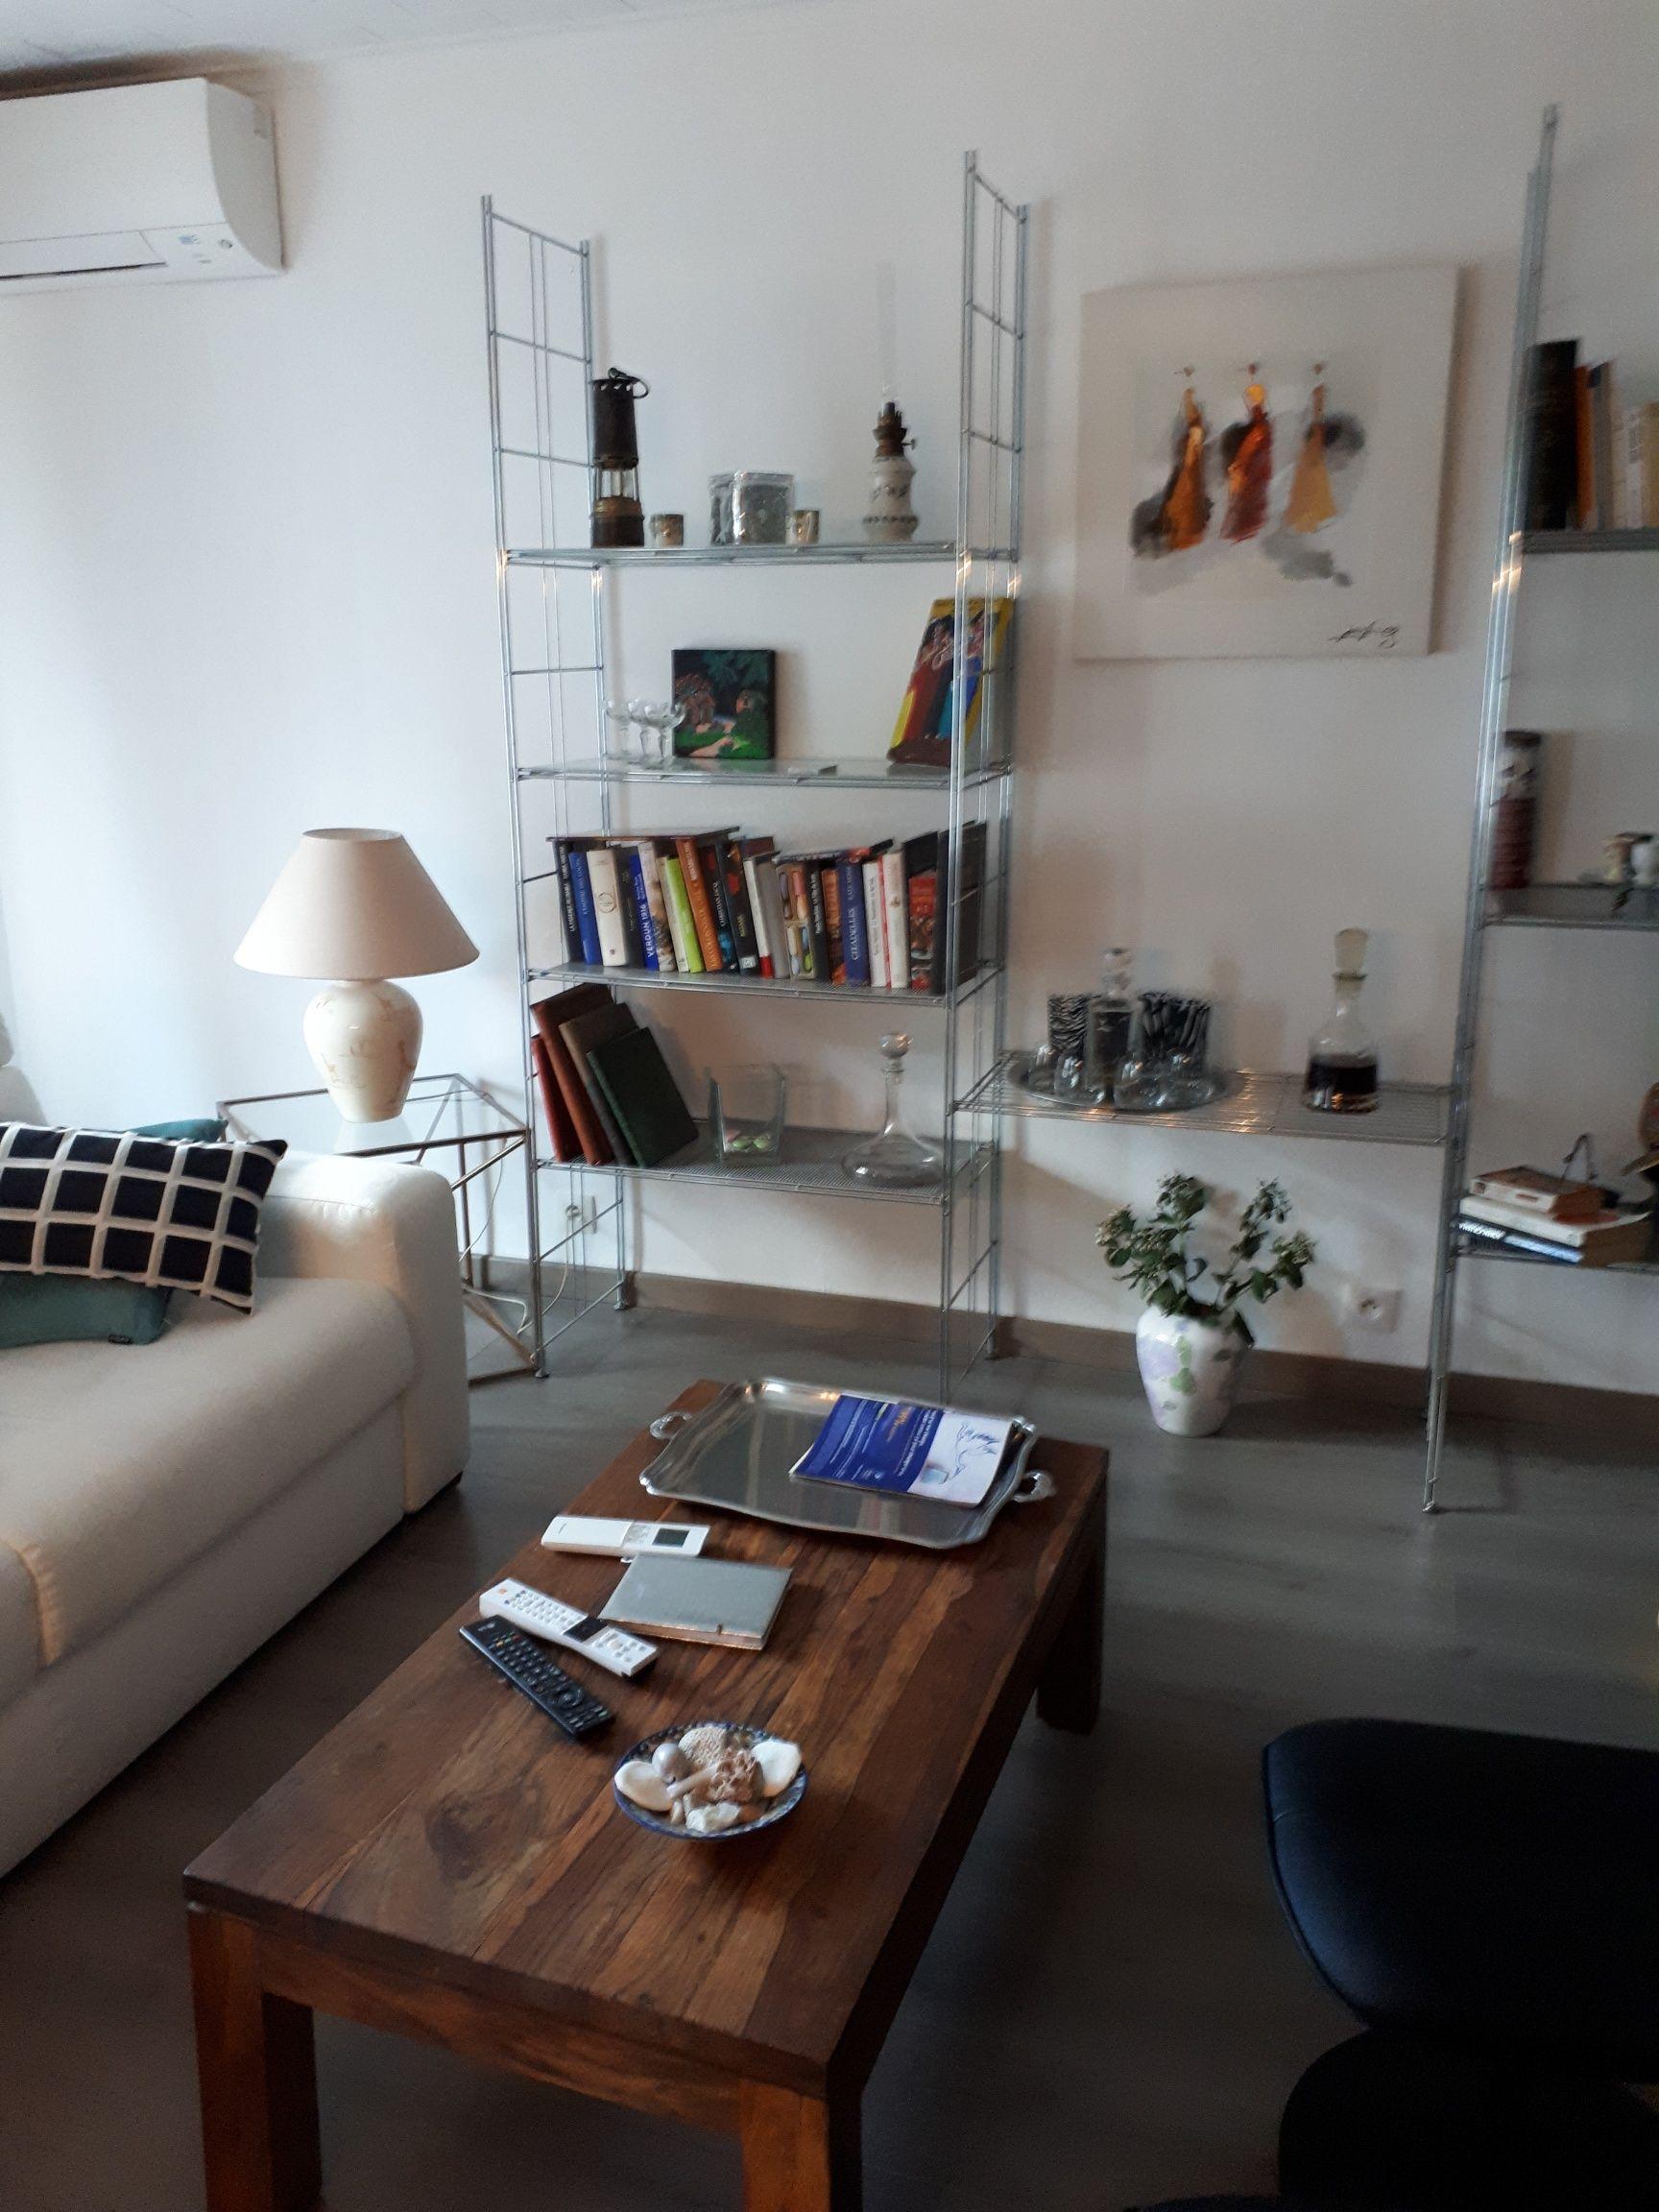 Cuisine-Colocation Perpignan NA & Location Chambre à louer Perpignan NA | Loue chambre meublée Perpignan NA | Logement Perpignan NA